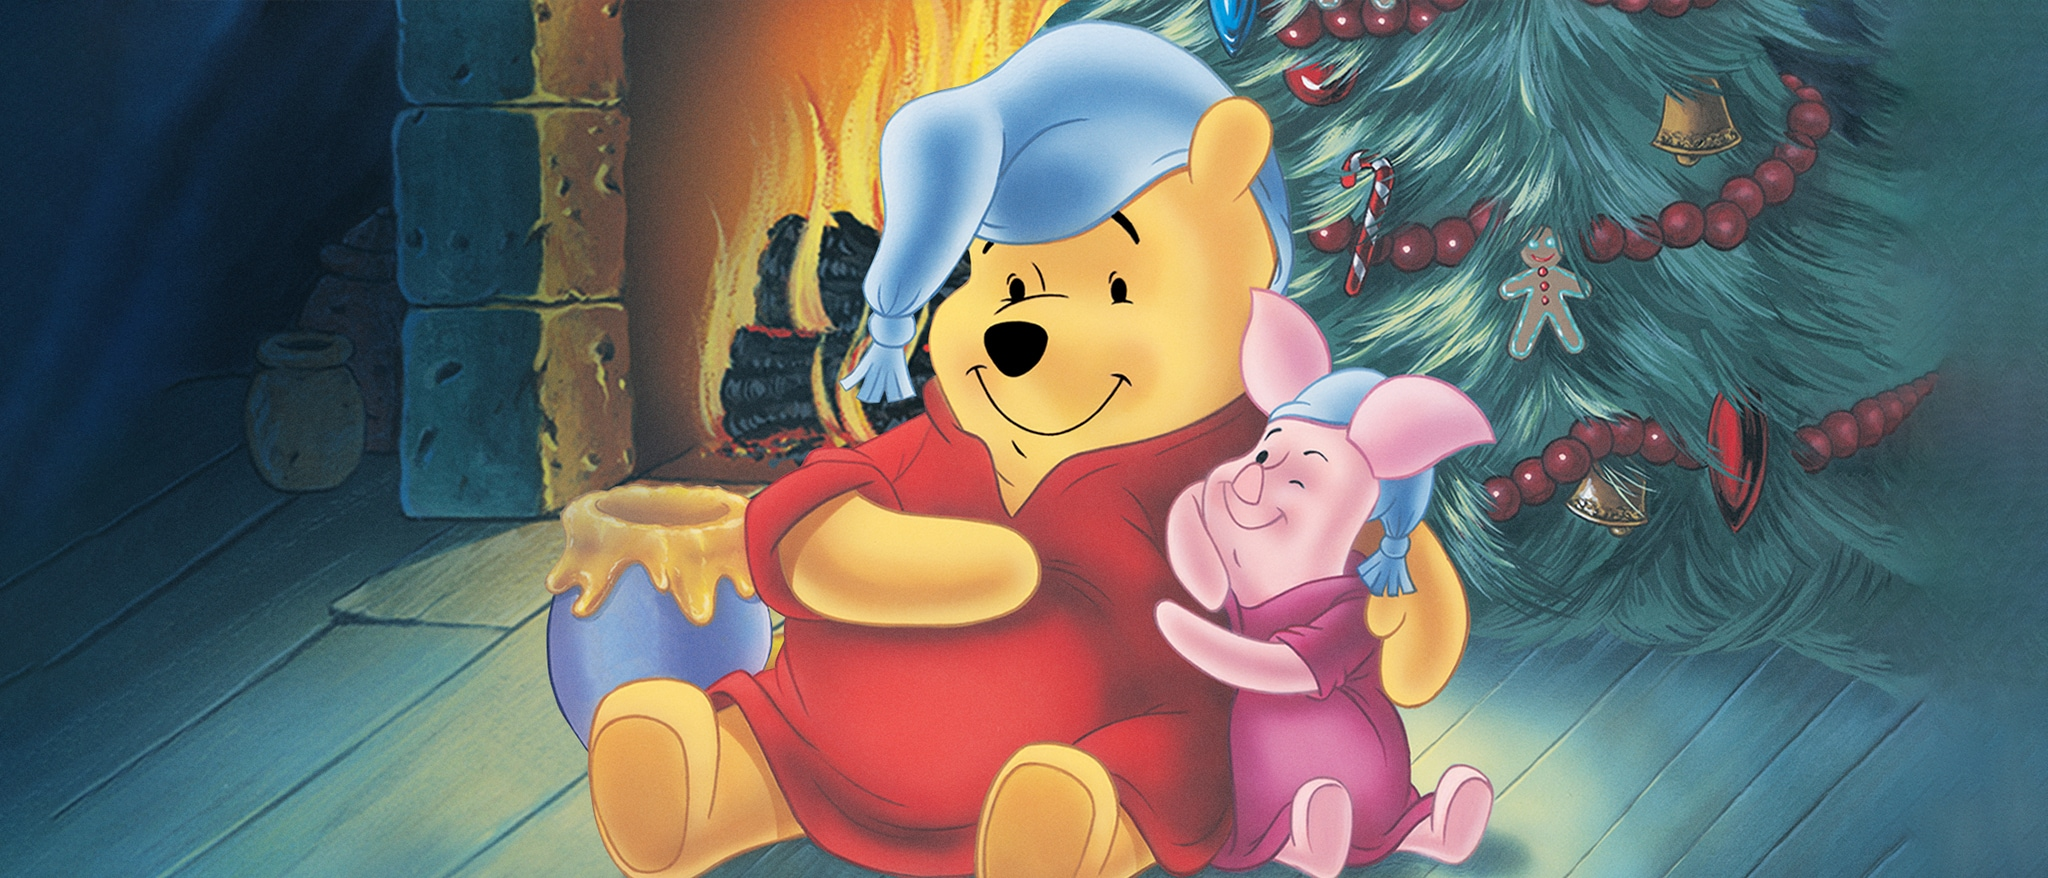 Winnie the Pooh: A Very Merry Pooh Year Hero